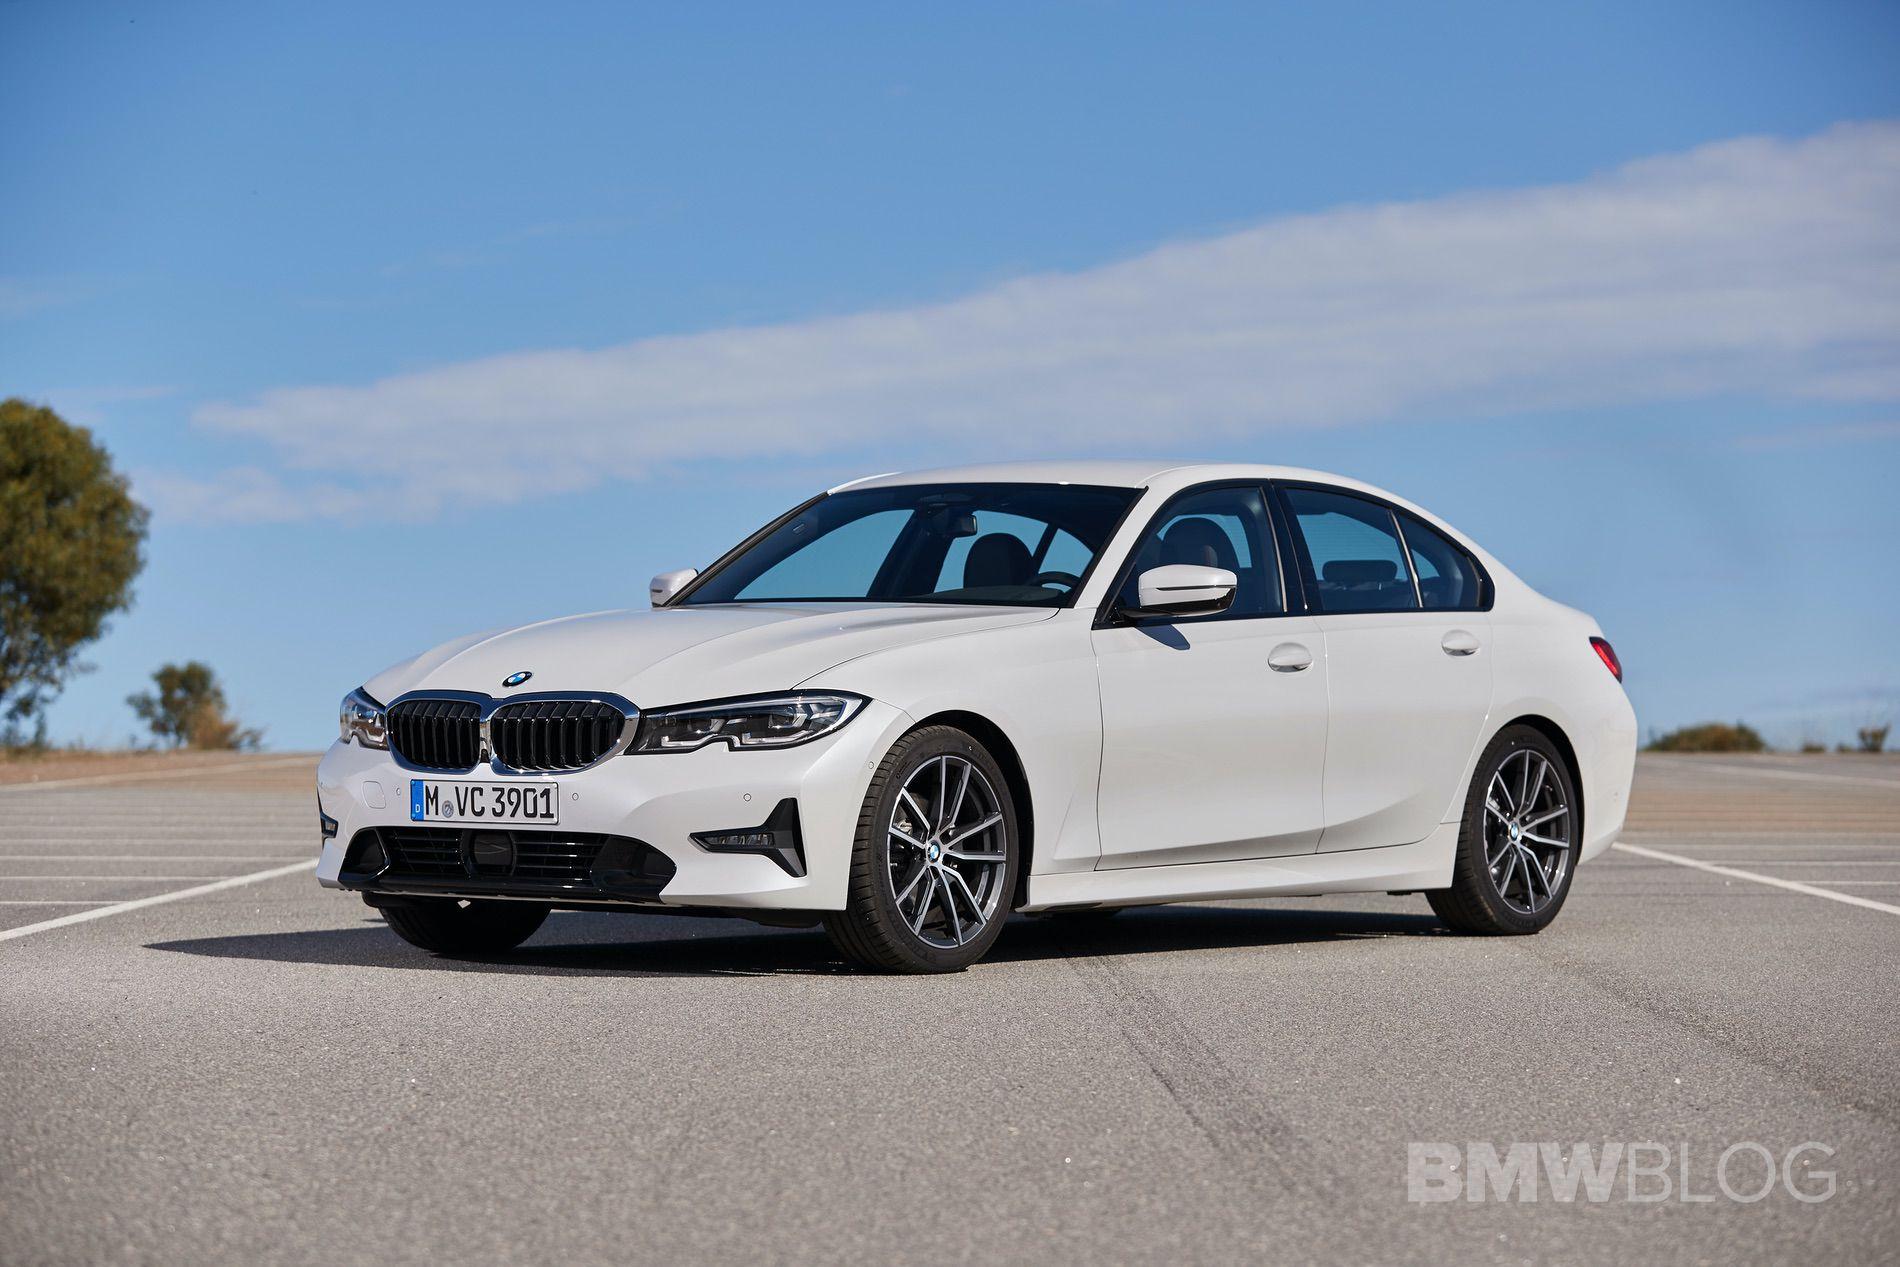 2019 BMW 320d G20 test drive 91